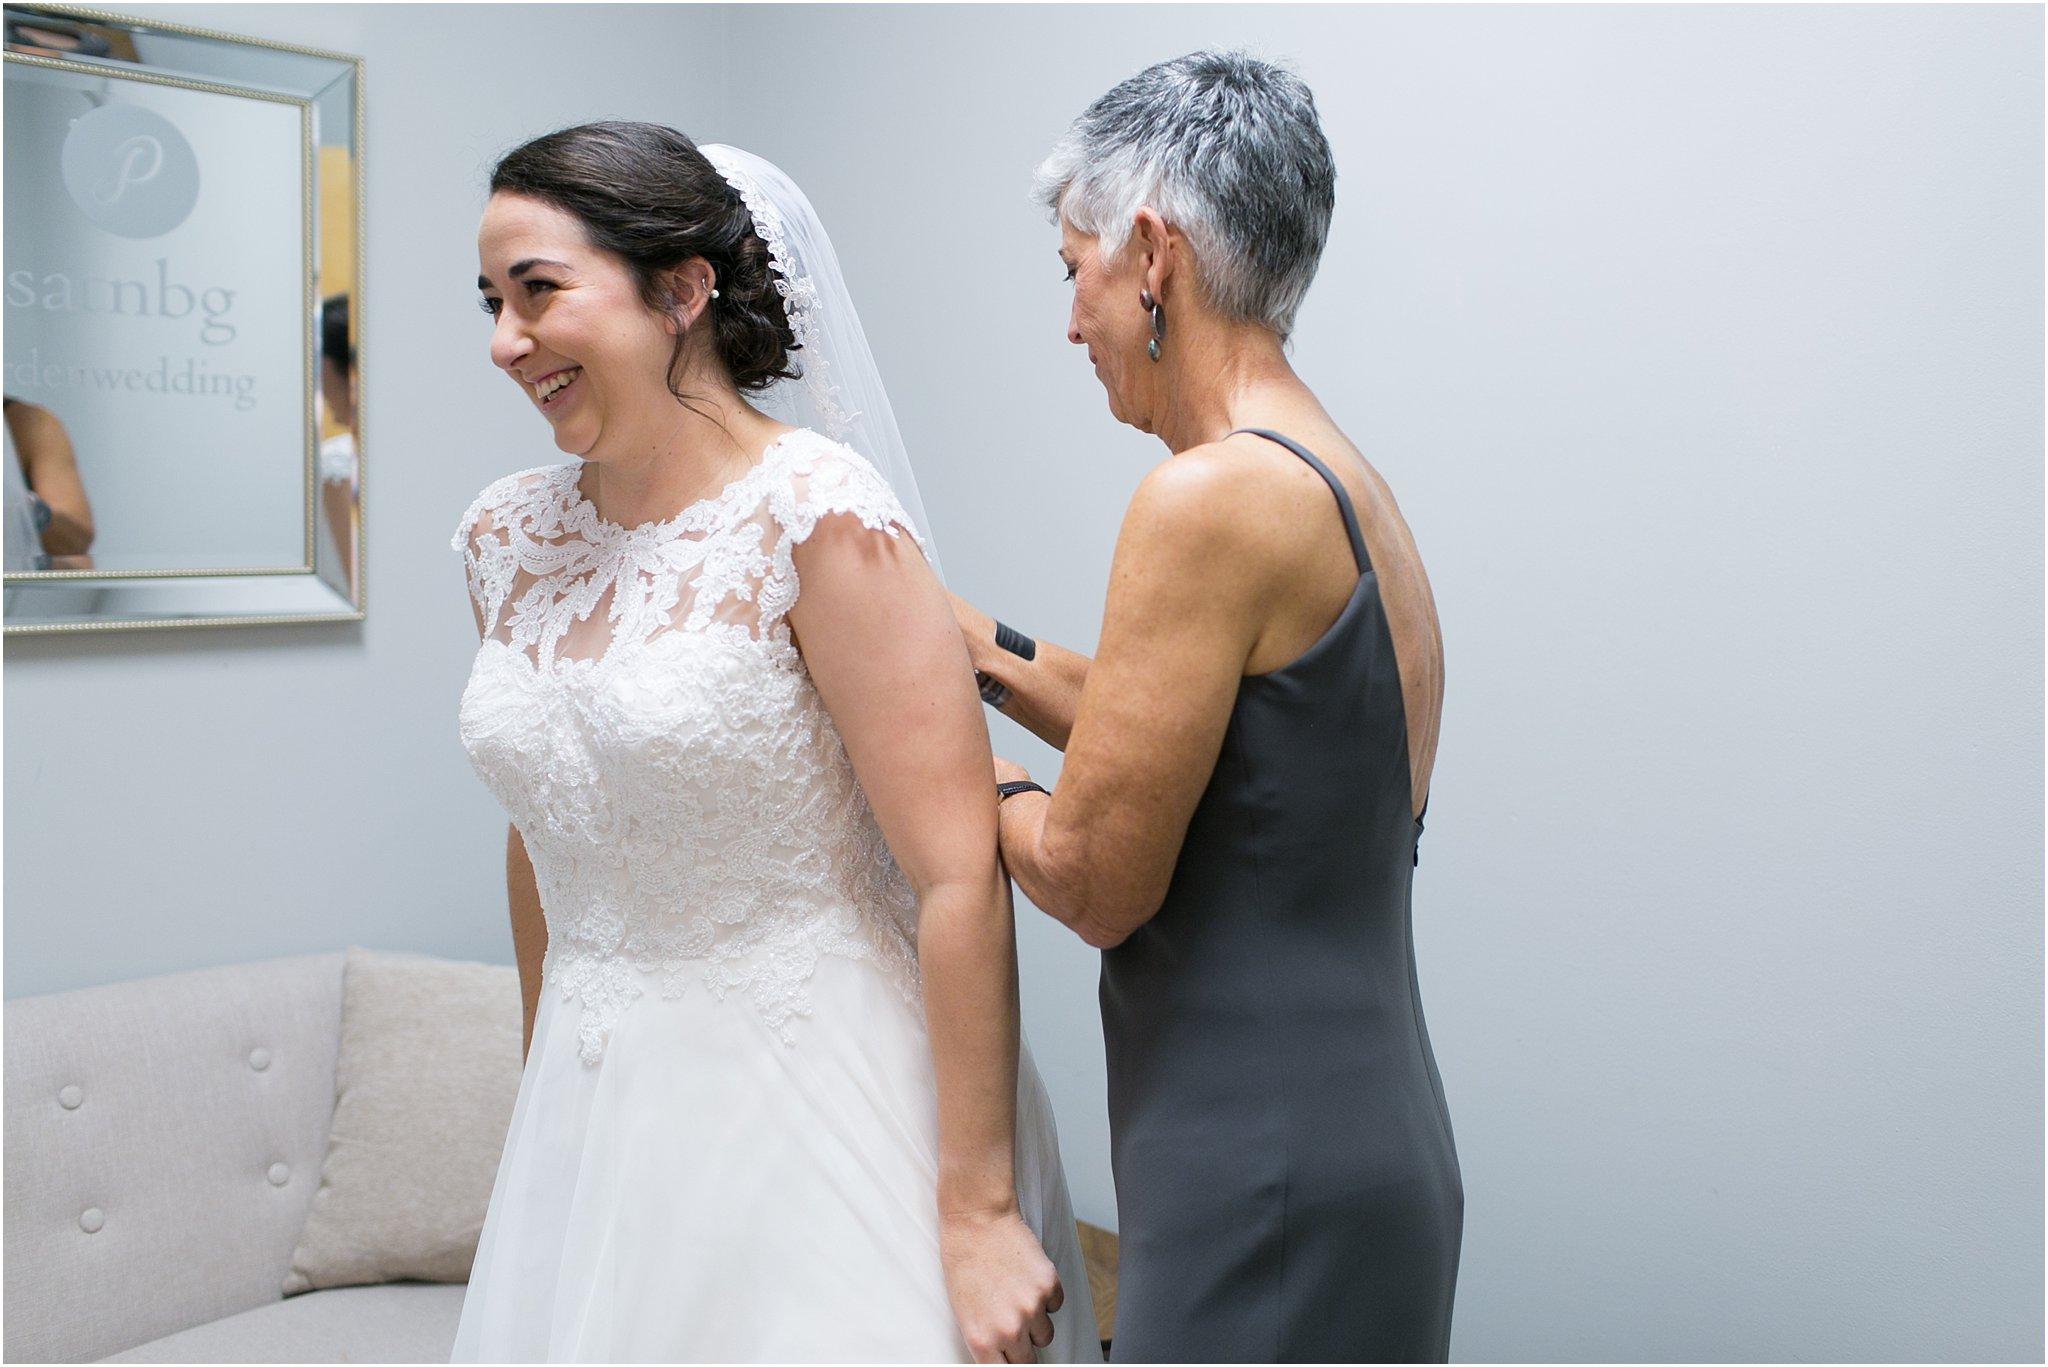 jessica_ryan_photography_virginia_wedding_photographer_wedding_hurricane_norfolk_botanical_gardens_hurricane_matthew_wedding_3549